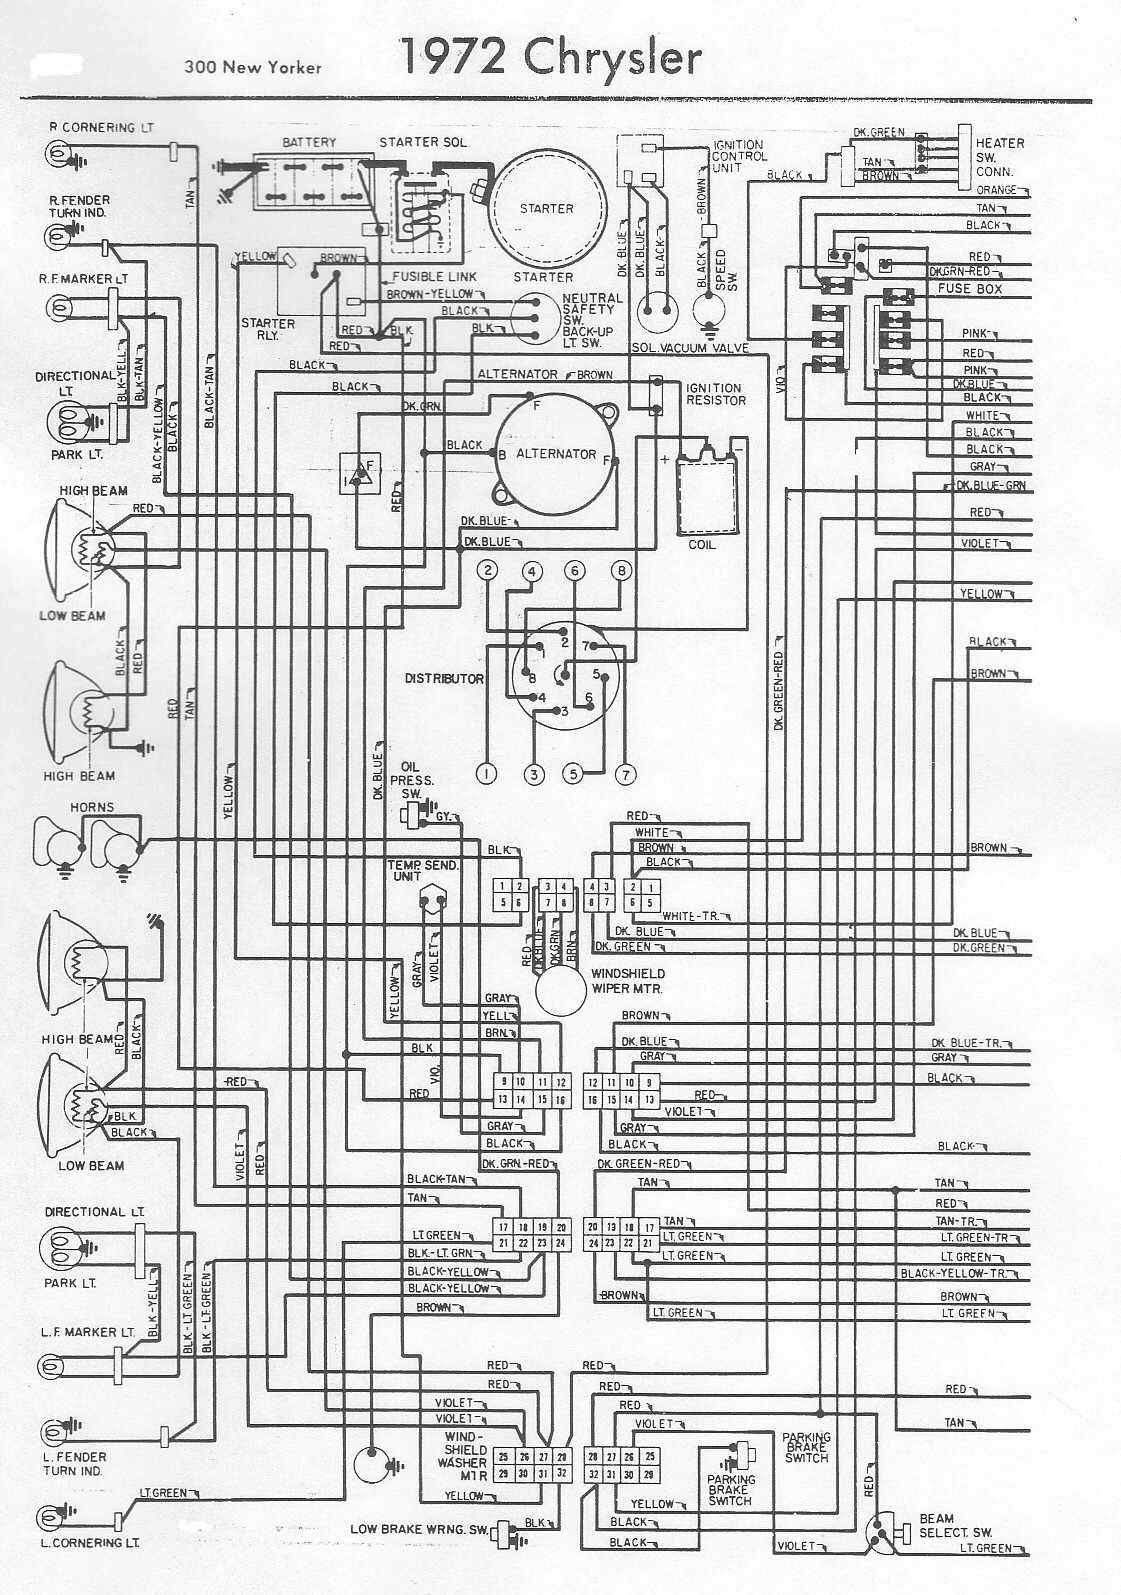 1993 Chrysler New Yorker Fuse Diagram Wiring Schematic Pontiac Grand Prix Box Dodge Ram Jeep Cherokee Ford Bronco